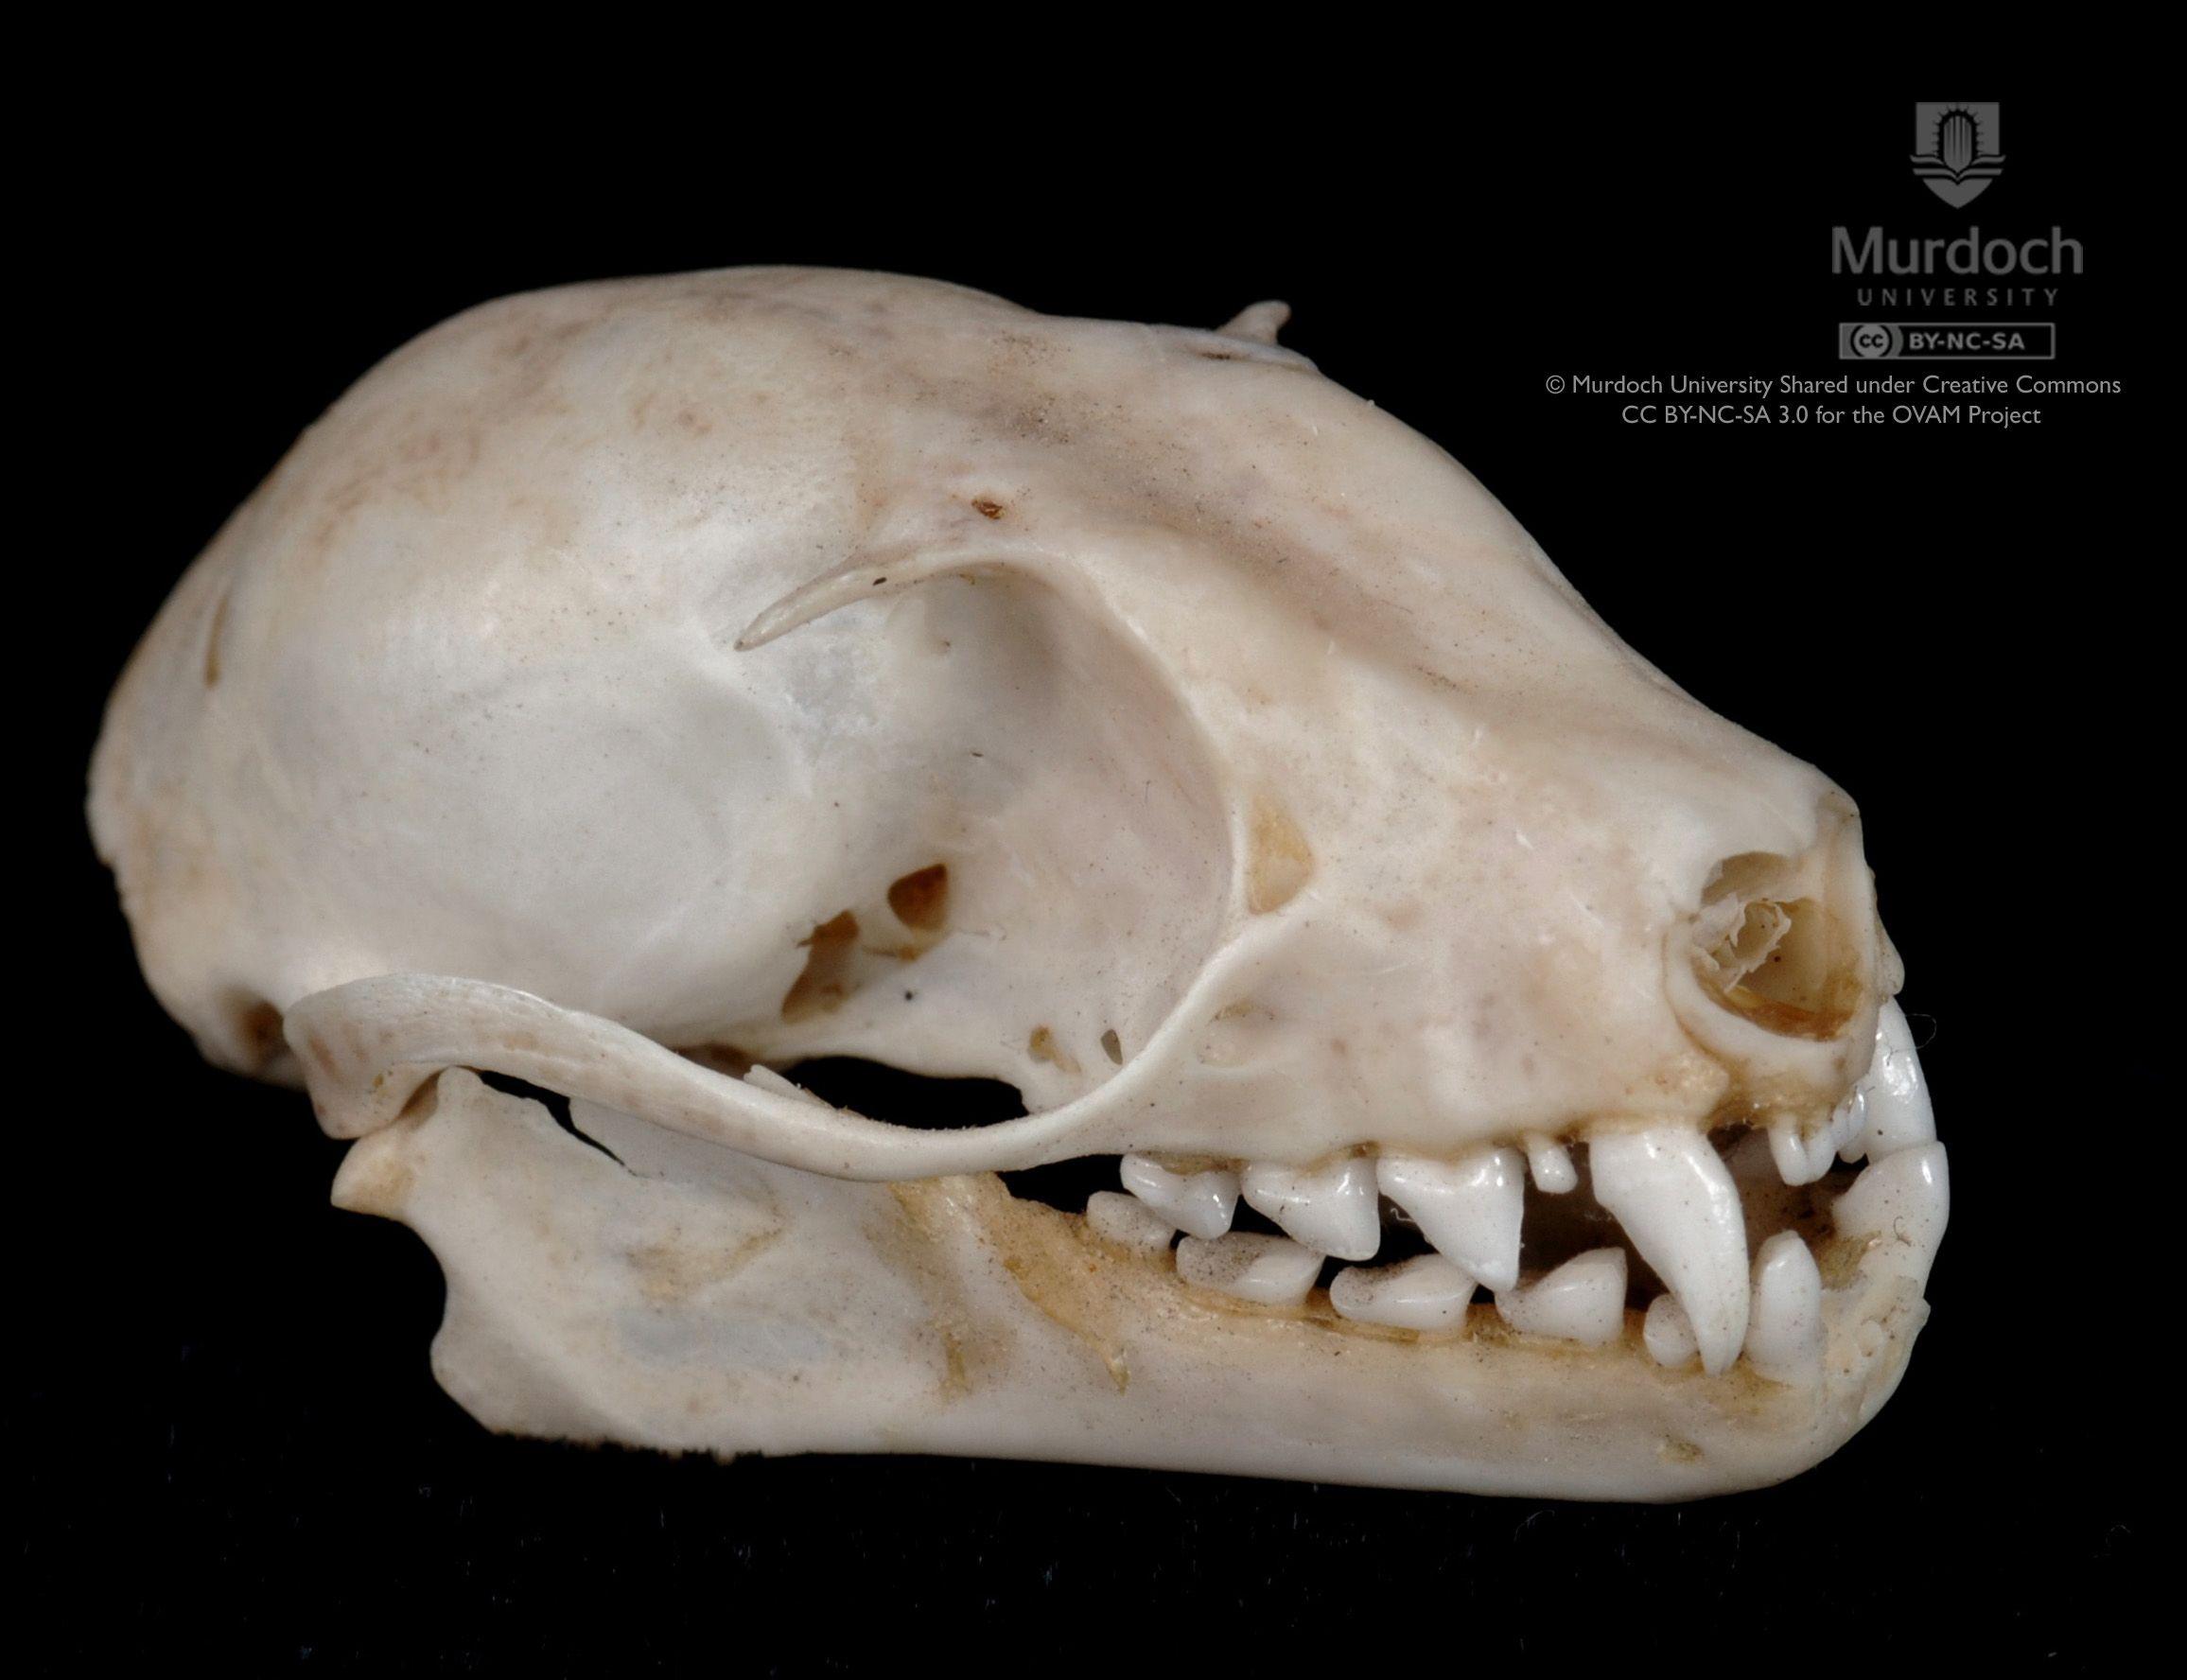 fruit bat skull bat anatomy anatomy study fruit bat animal skulls inktober [ 2312 x 1776 Pixel ]